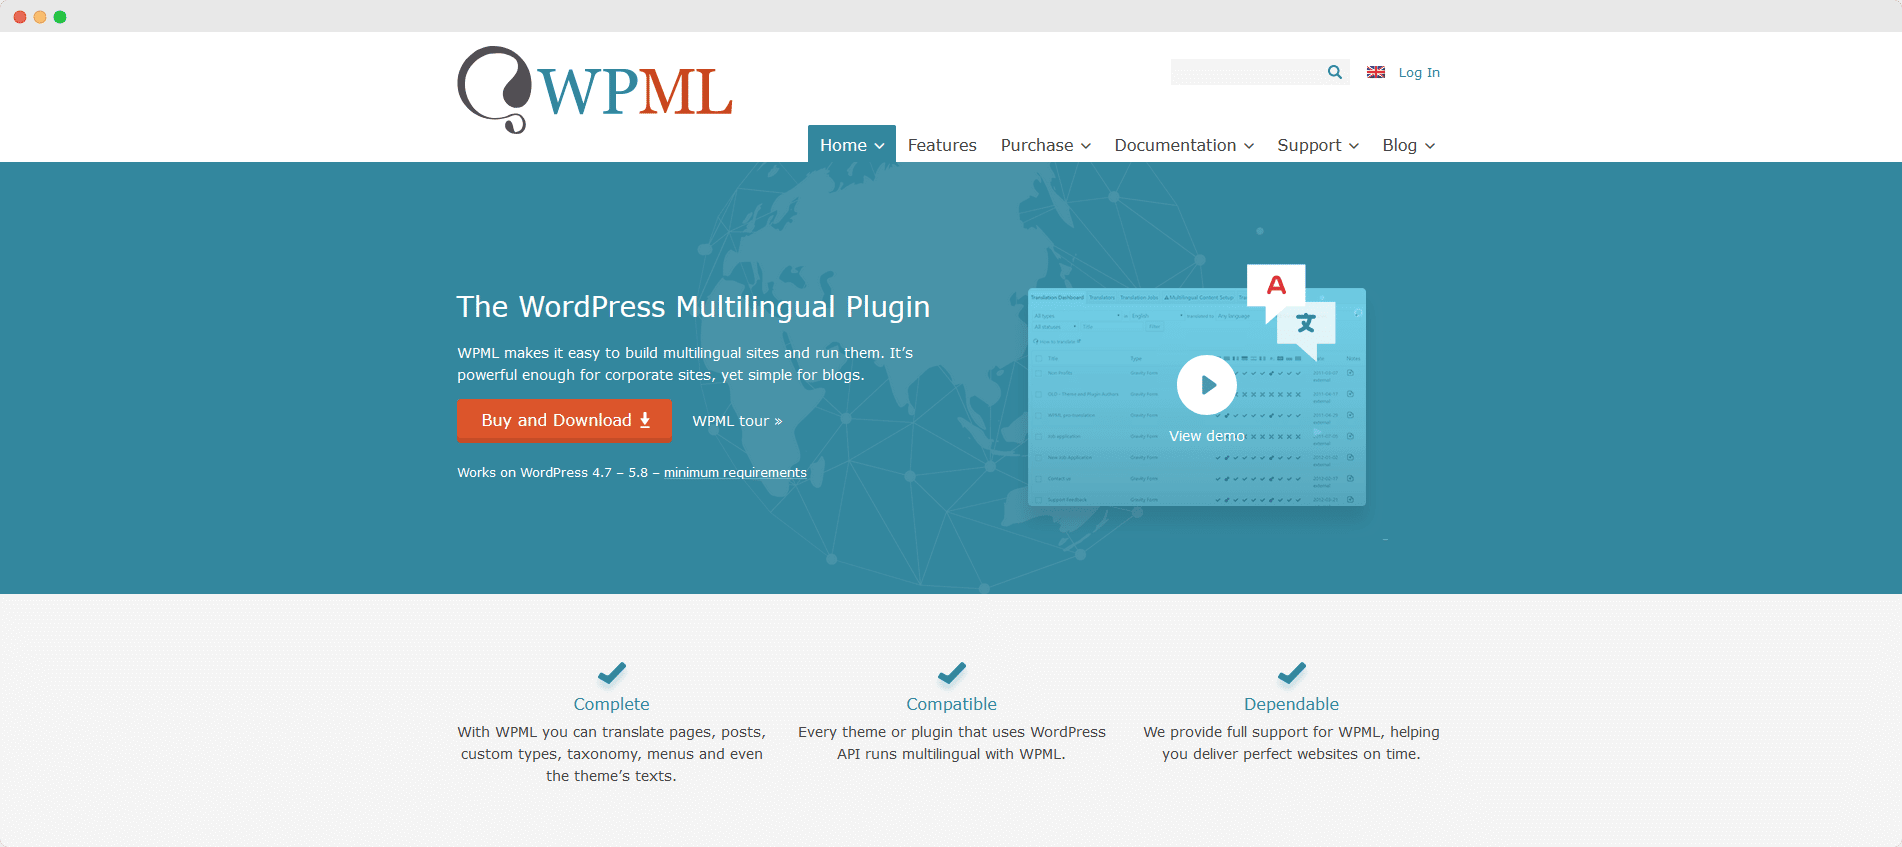 BetterDocs and WPML Partnership